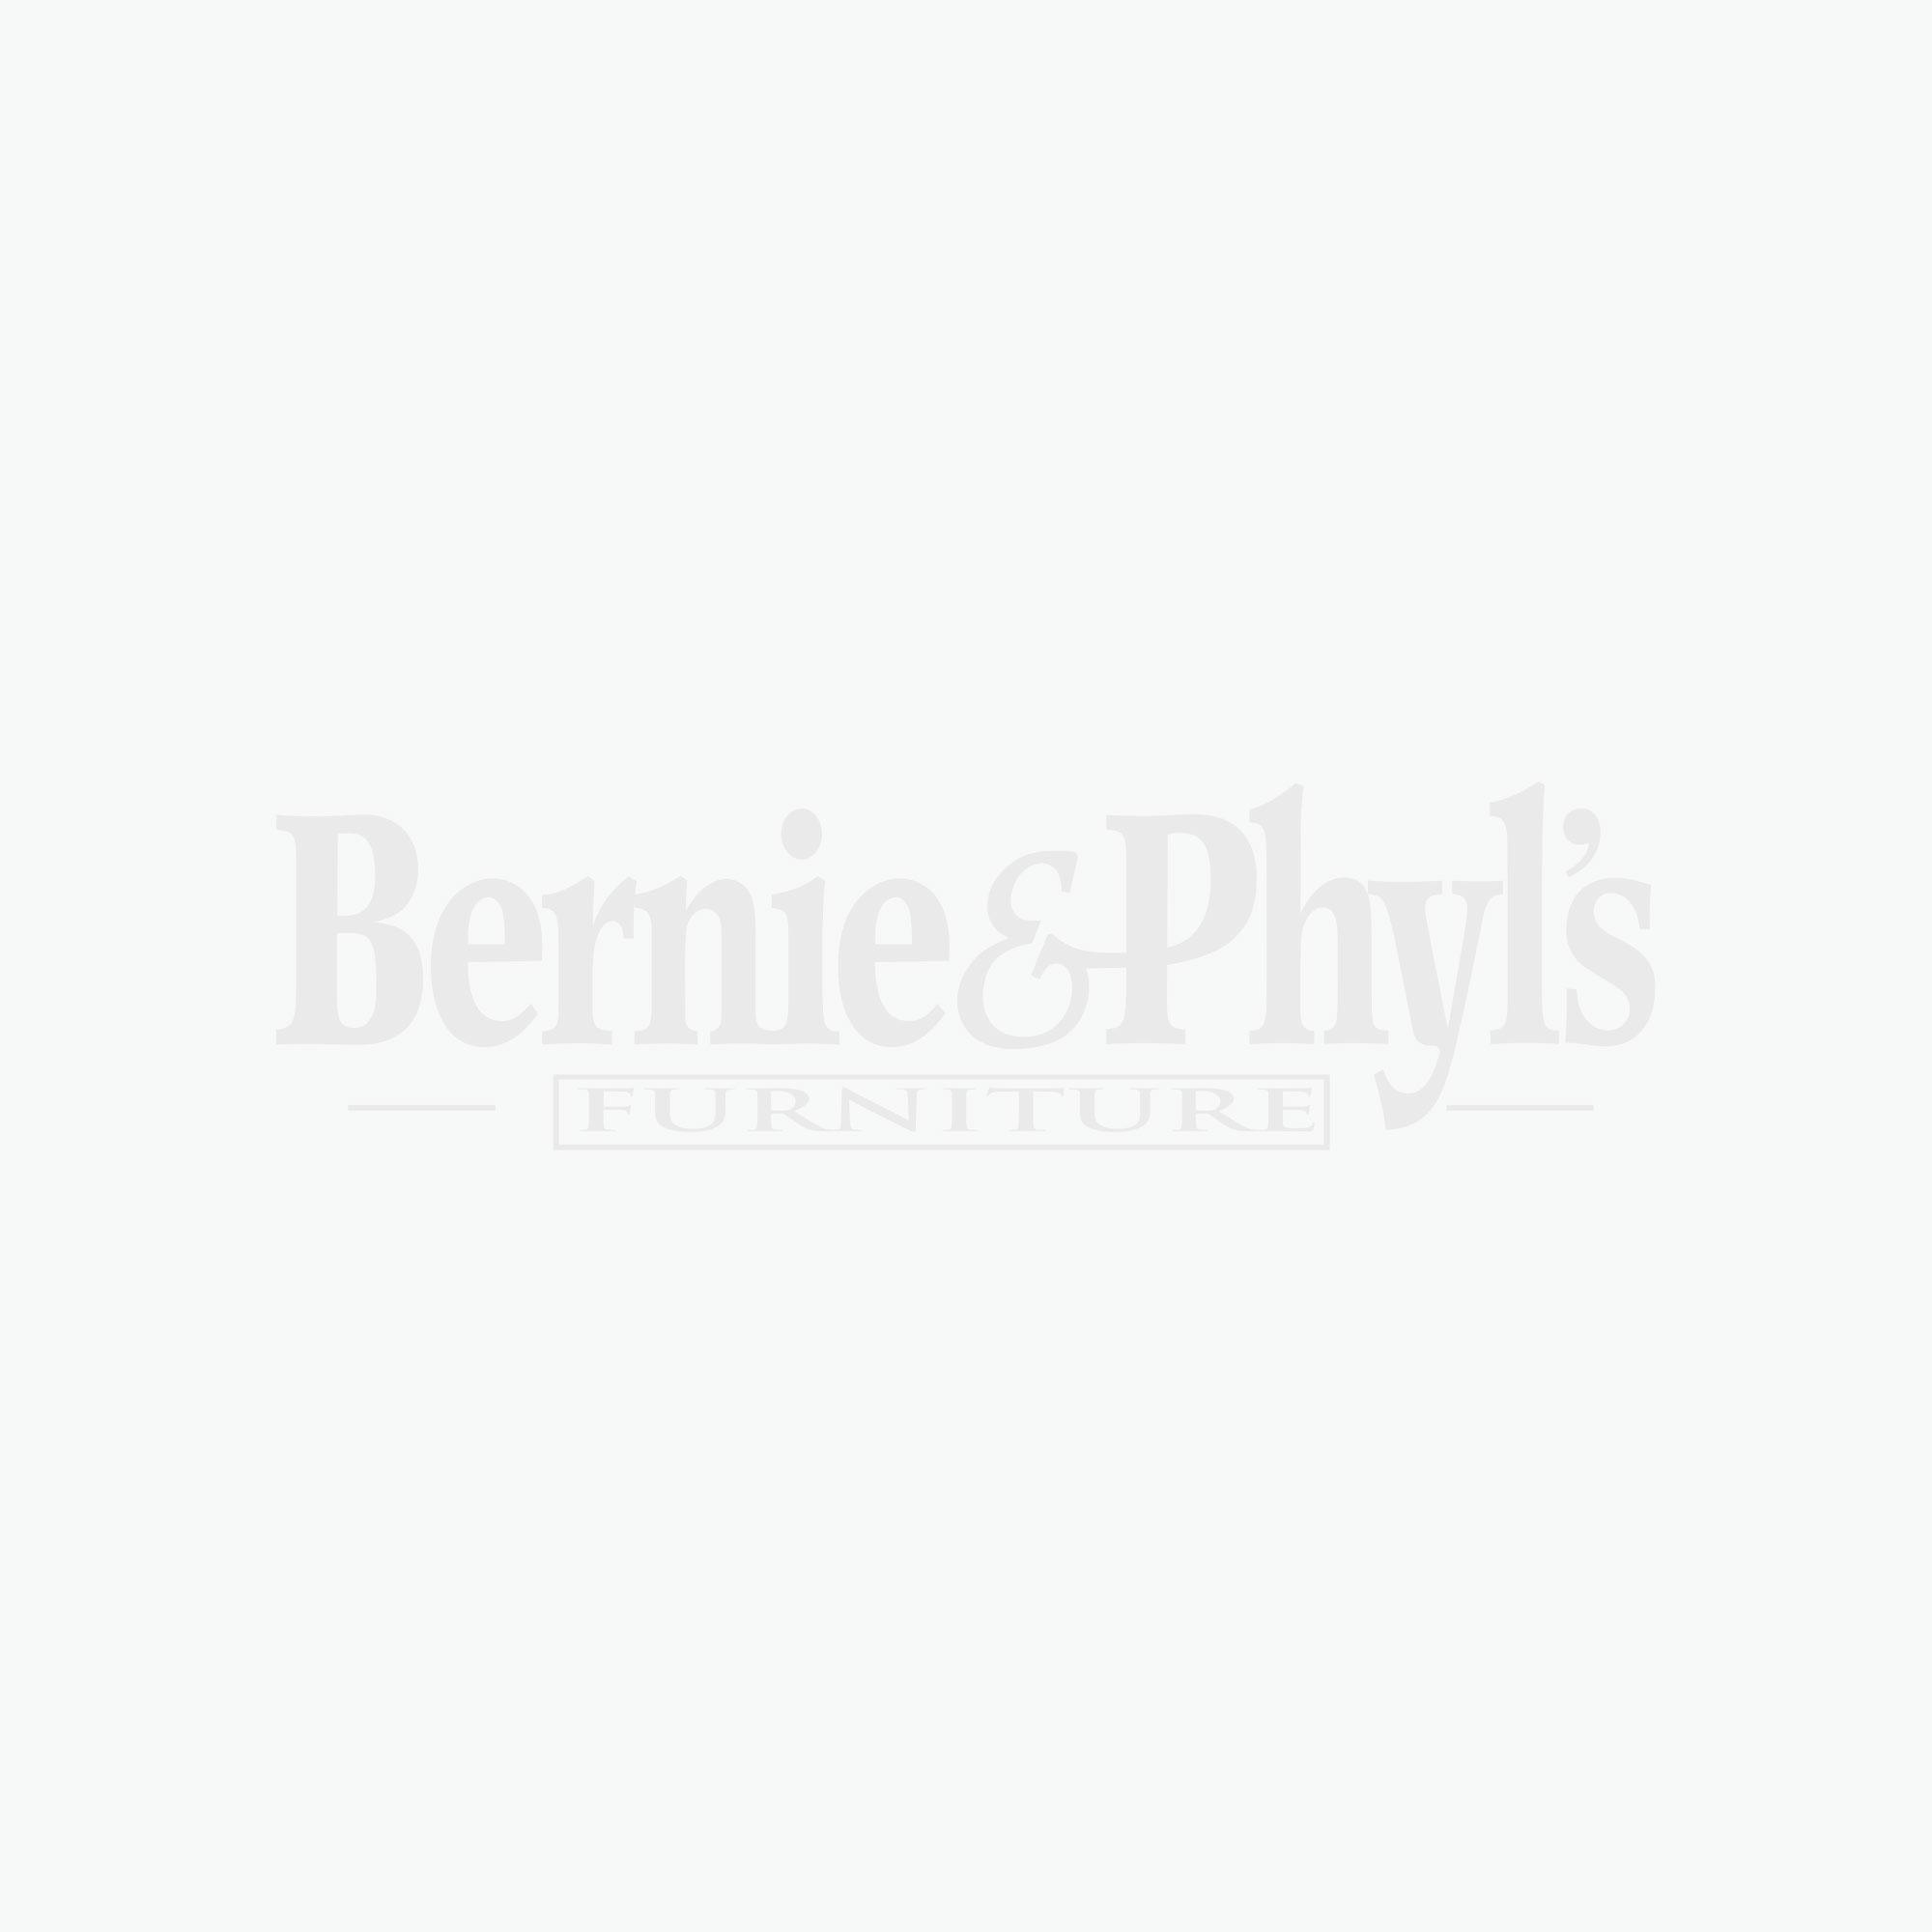 Boston Bank Storage End Table - Bernie u0026 Phylu2019s Furniture ...